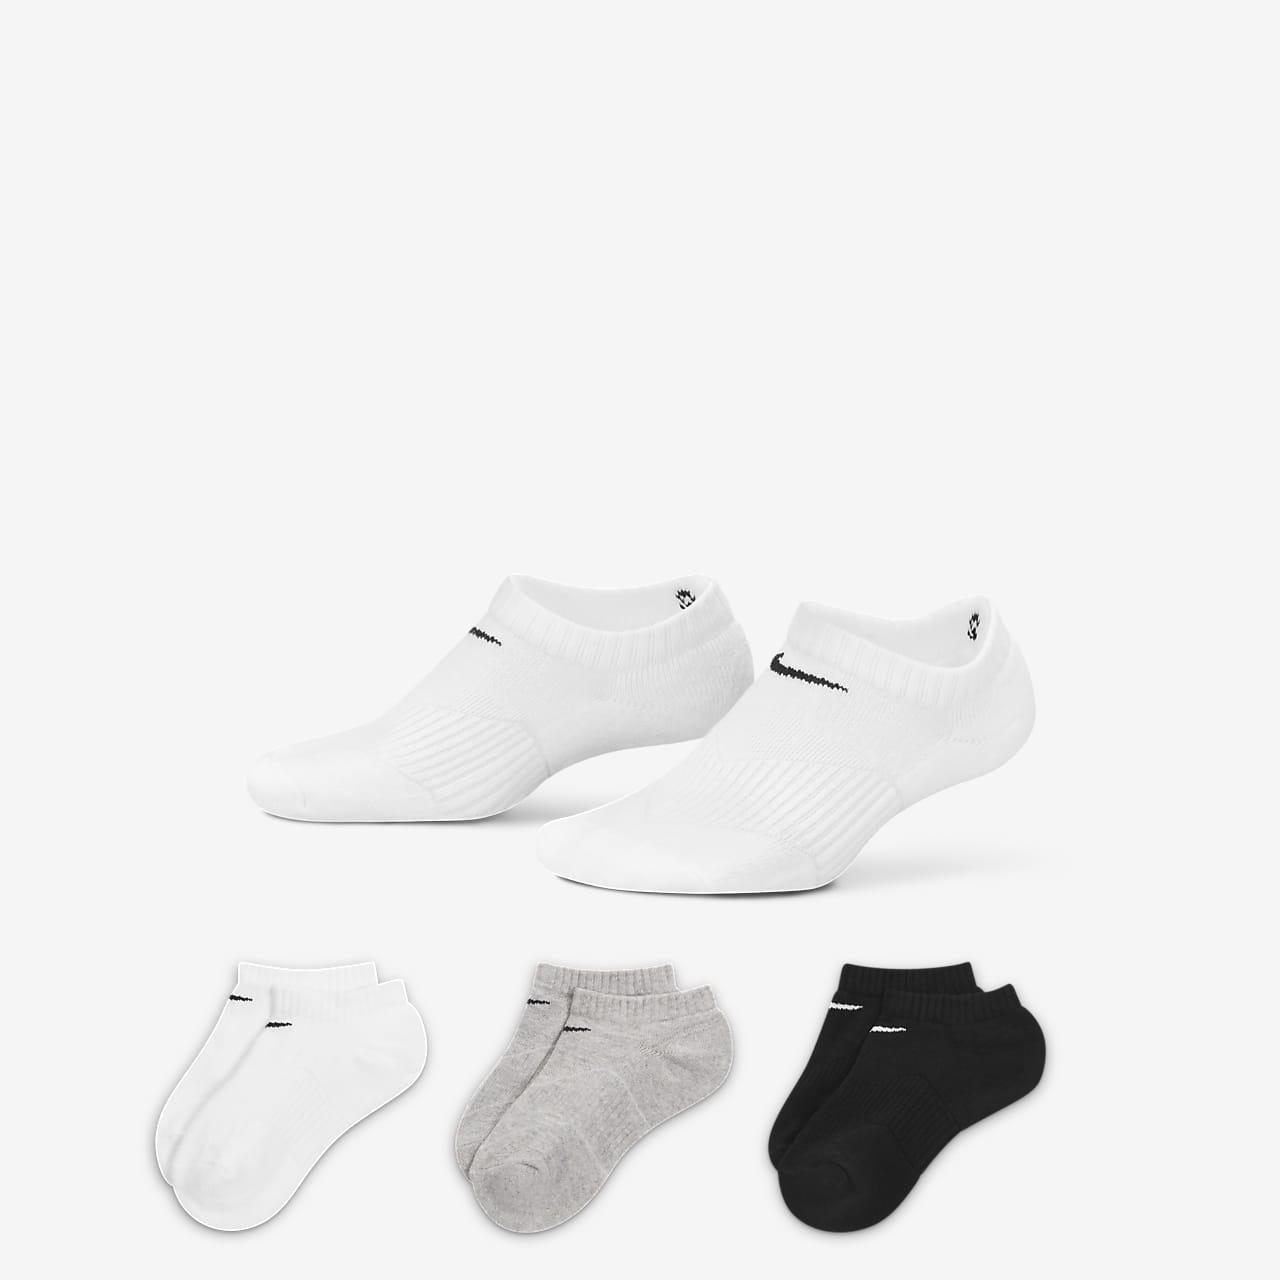 Nike Performance Cushion No-Show Socken für ältere Kinder (3 Paar)